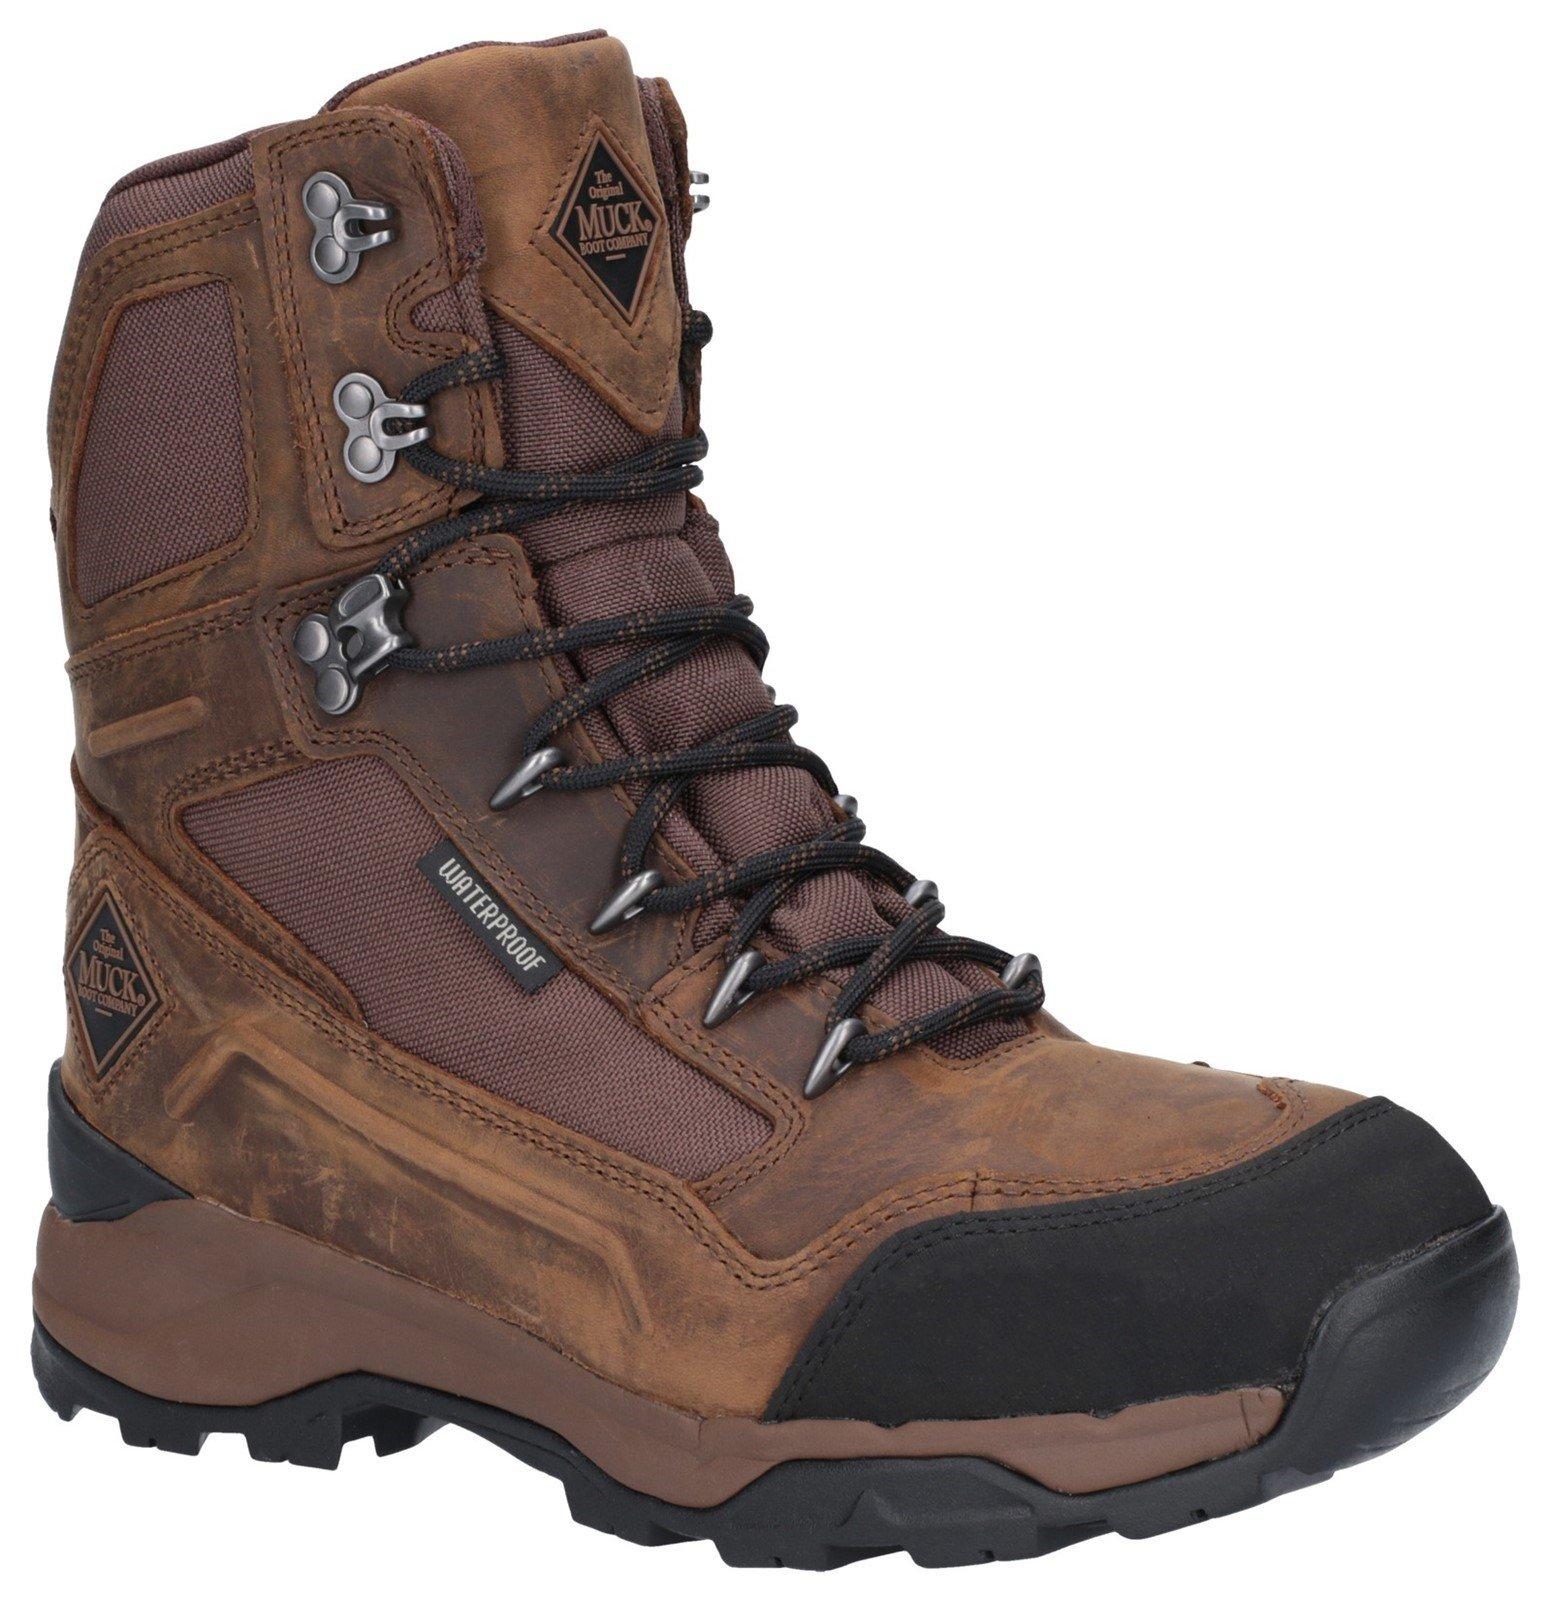 "Muck Boots Men's Summit 8"" Warm Weather Performance Boot Brown 27623 - Brown 12"